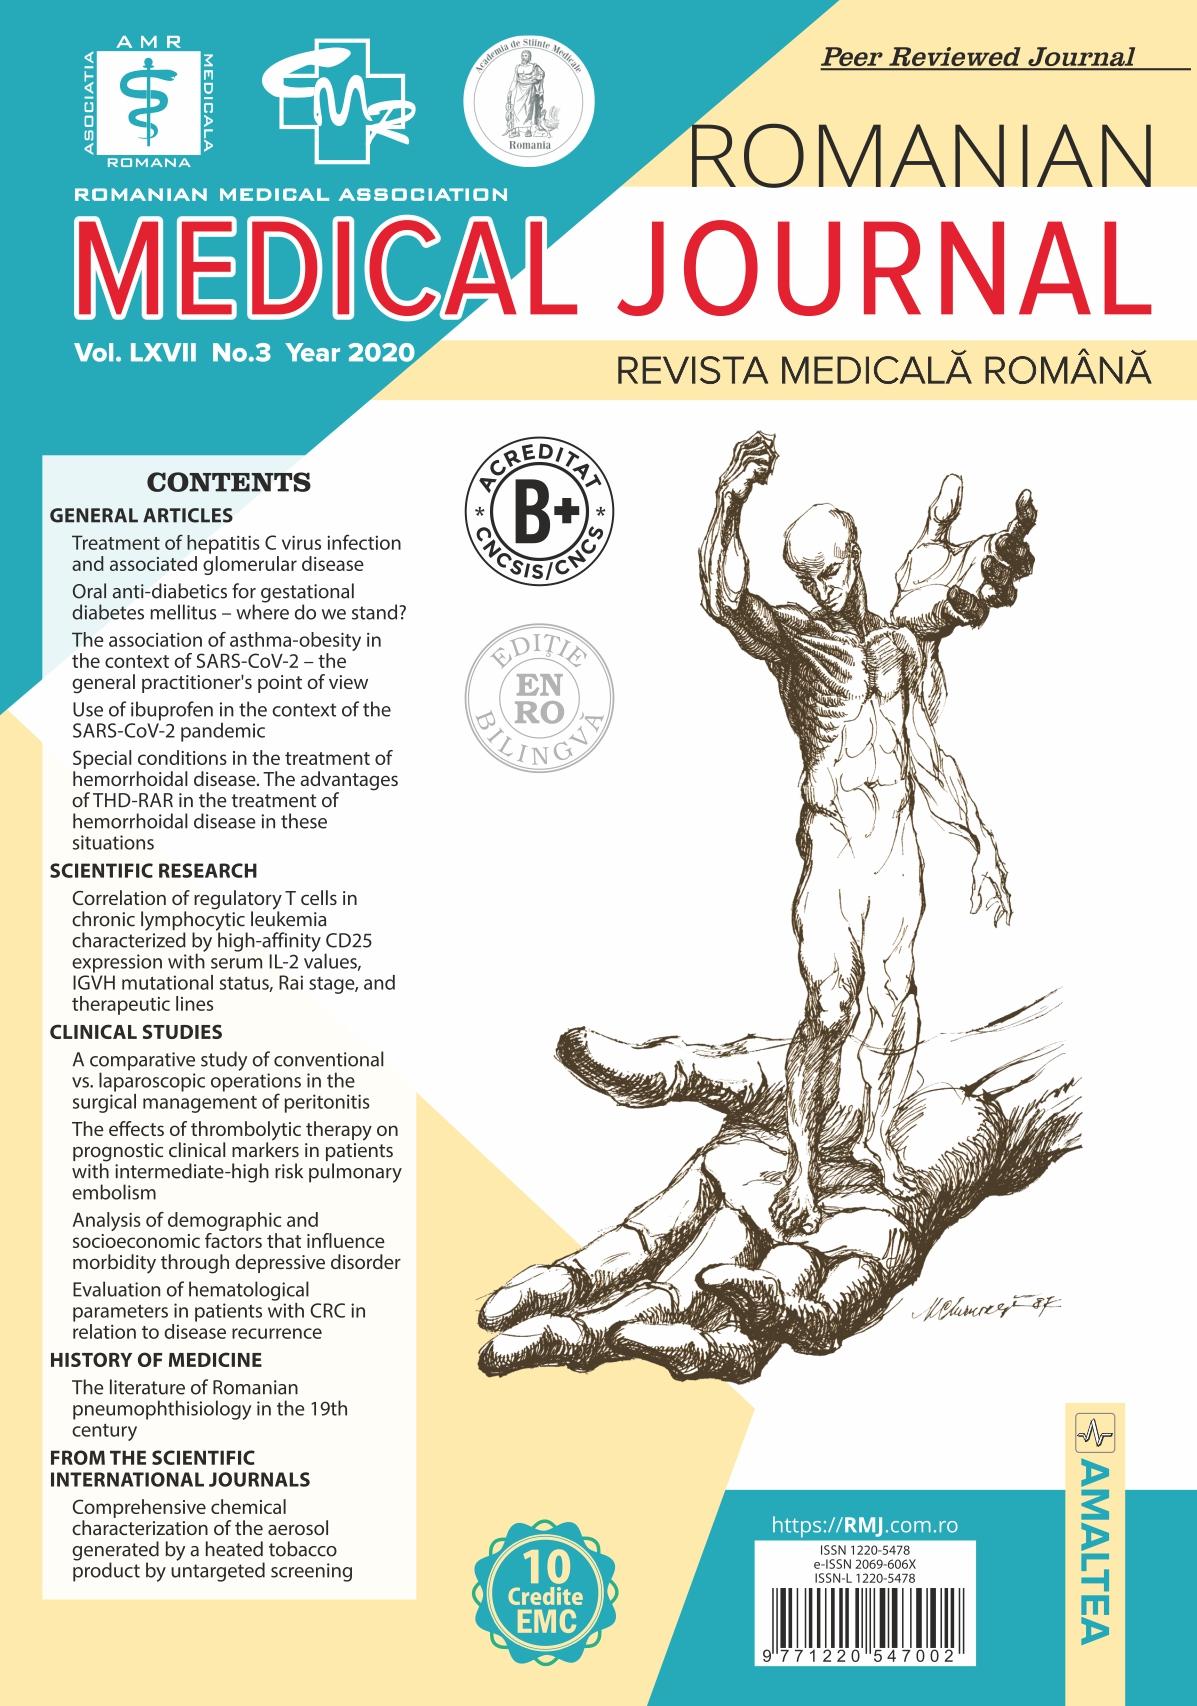 Romanian Medical Journal - REVISTA MEDICALA ROMANA, Vol. LXVII, No. 3, Year 2020